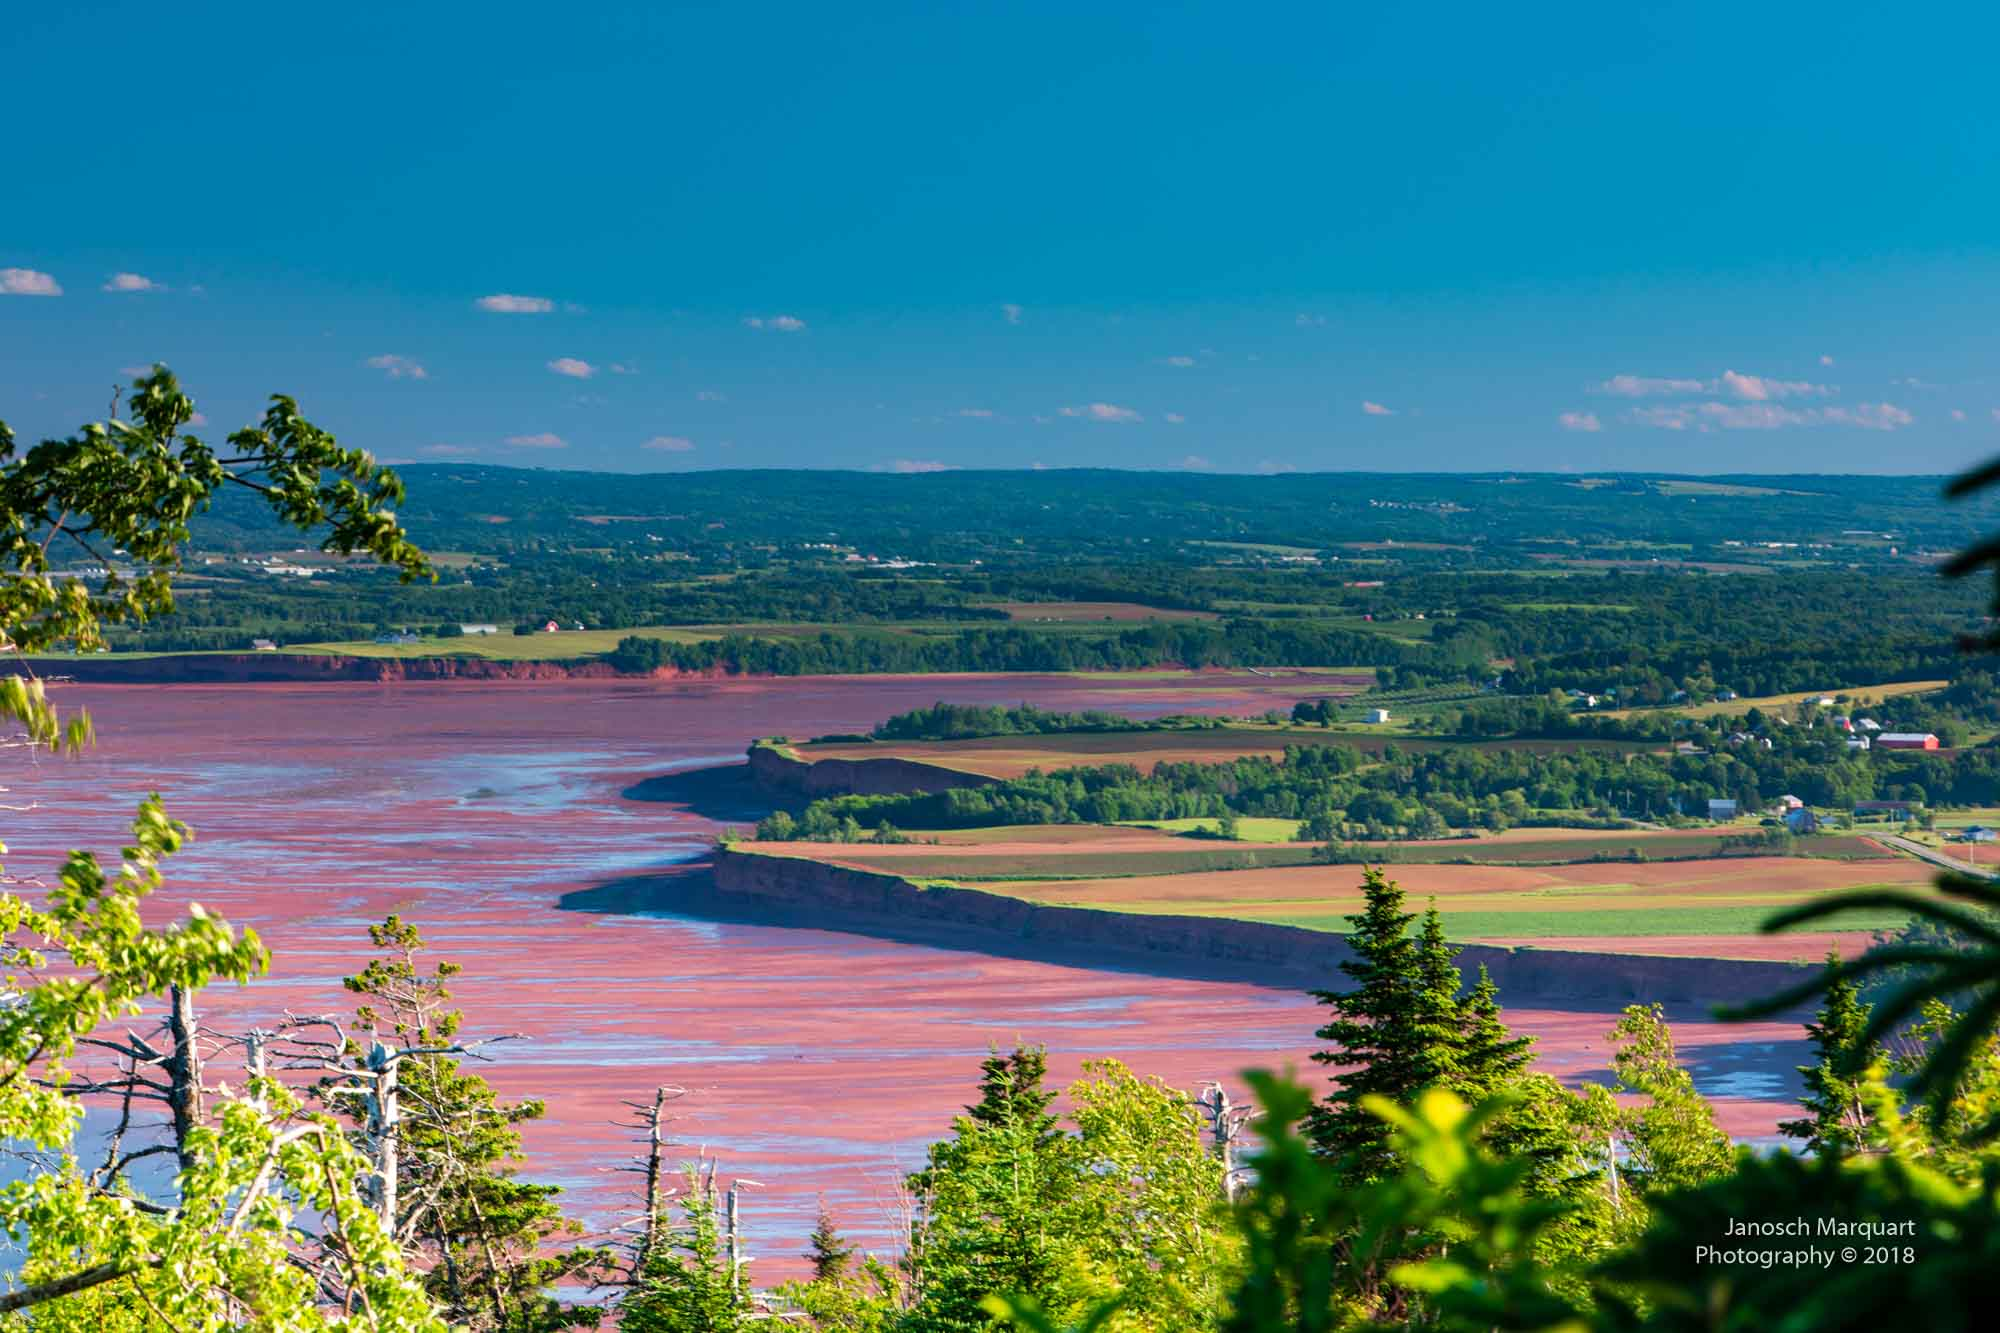 Foto der Ebbe in der Bay of Fundy.